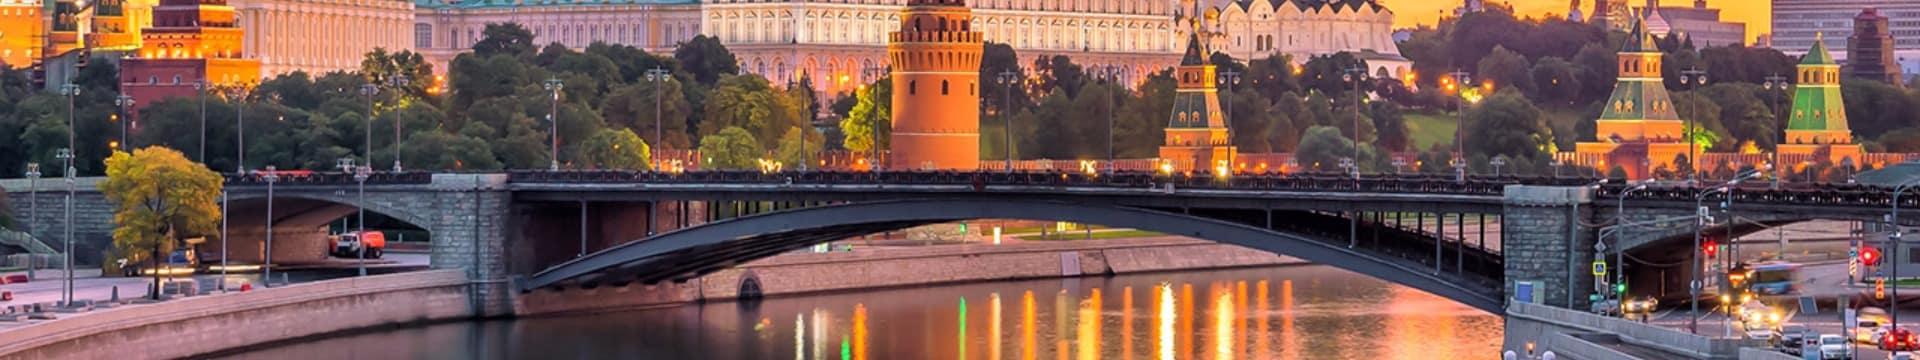 Kremlin de Moscou, Rússia.